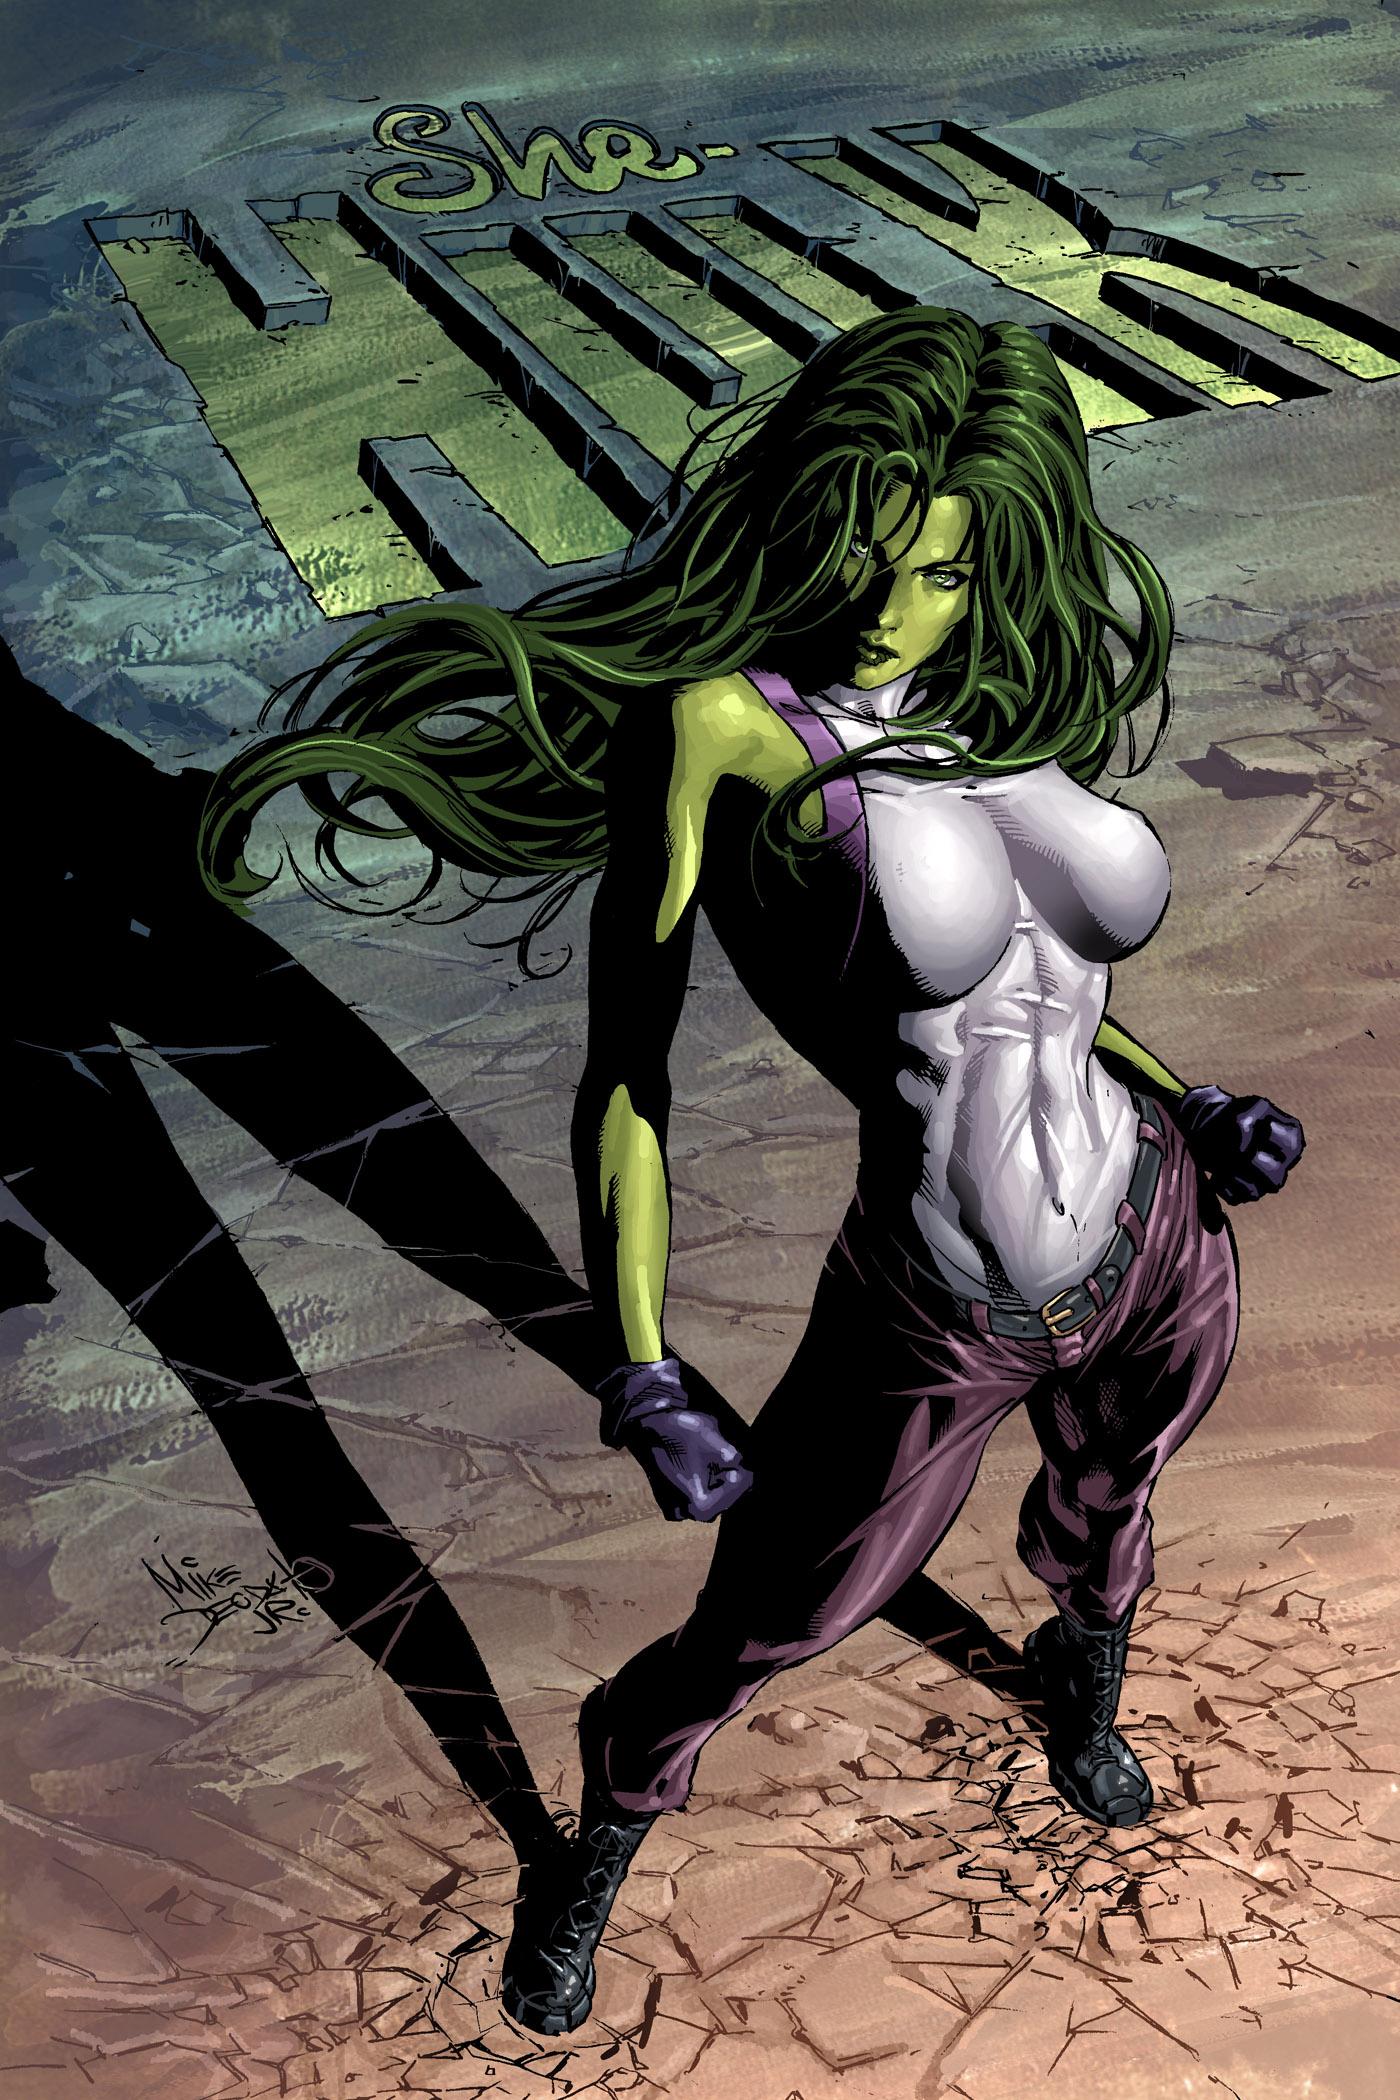 http://fc09.deviantart.net/fs30/f/2008/050/1/c/She_Hulk_29_by_Summerset.jpg